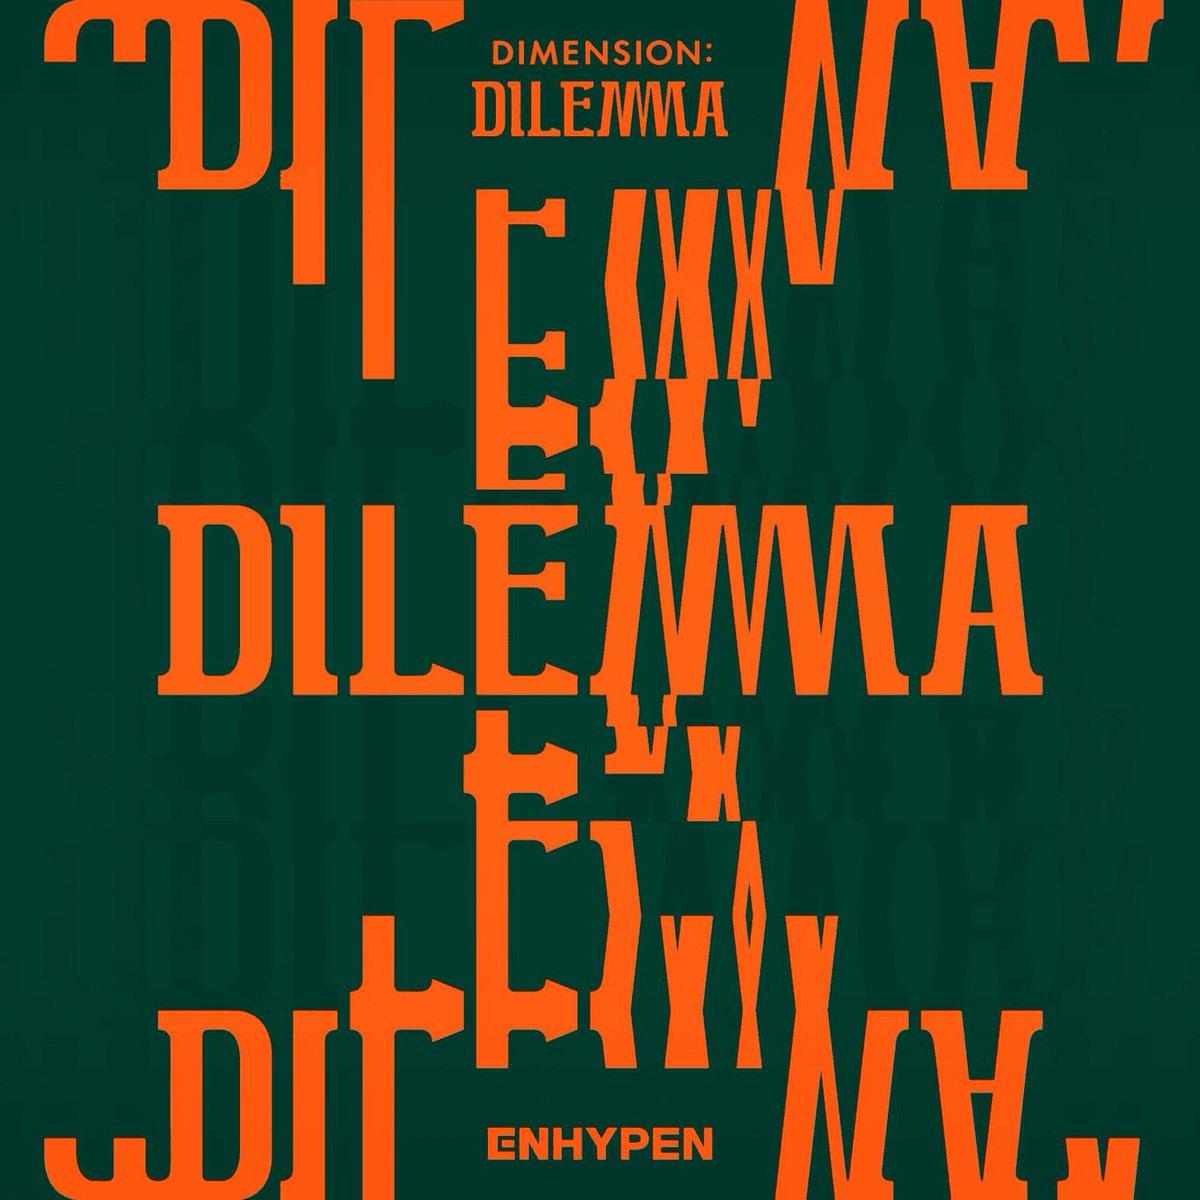 『ENHYPEN - Tamed-Dashed』収録の『DIMENSION : DILEMMA』ジャケット